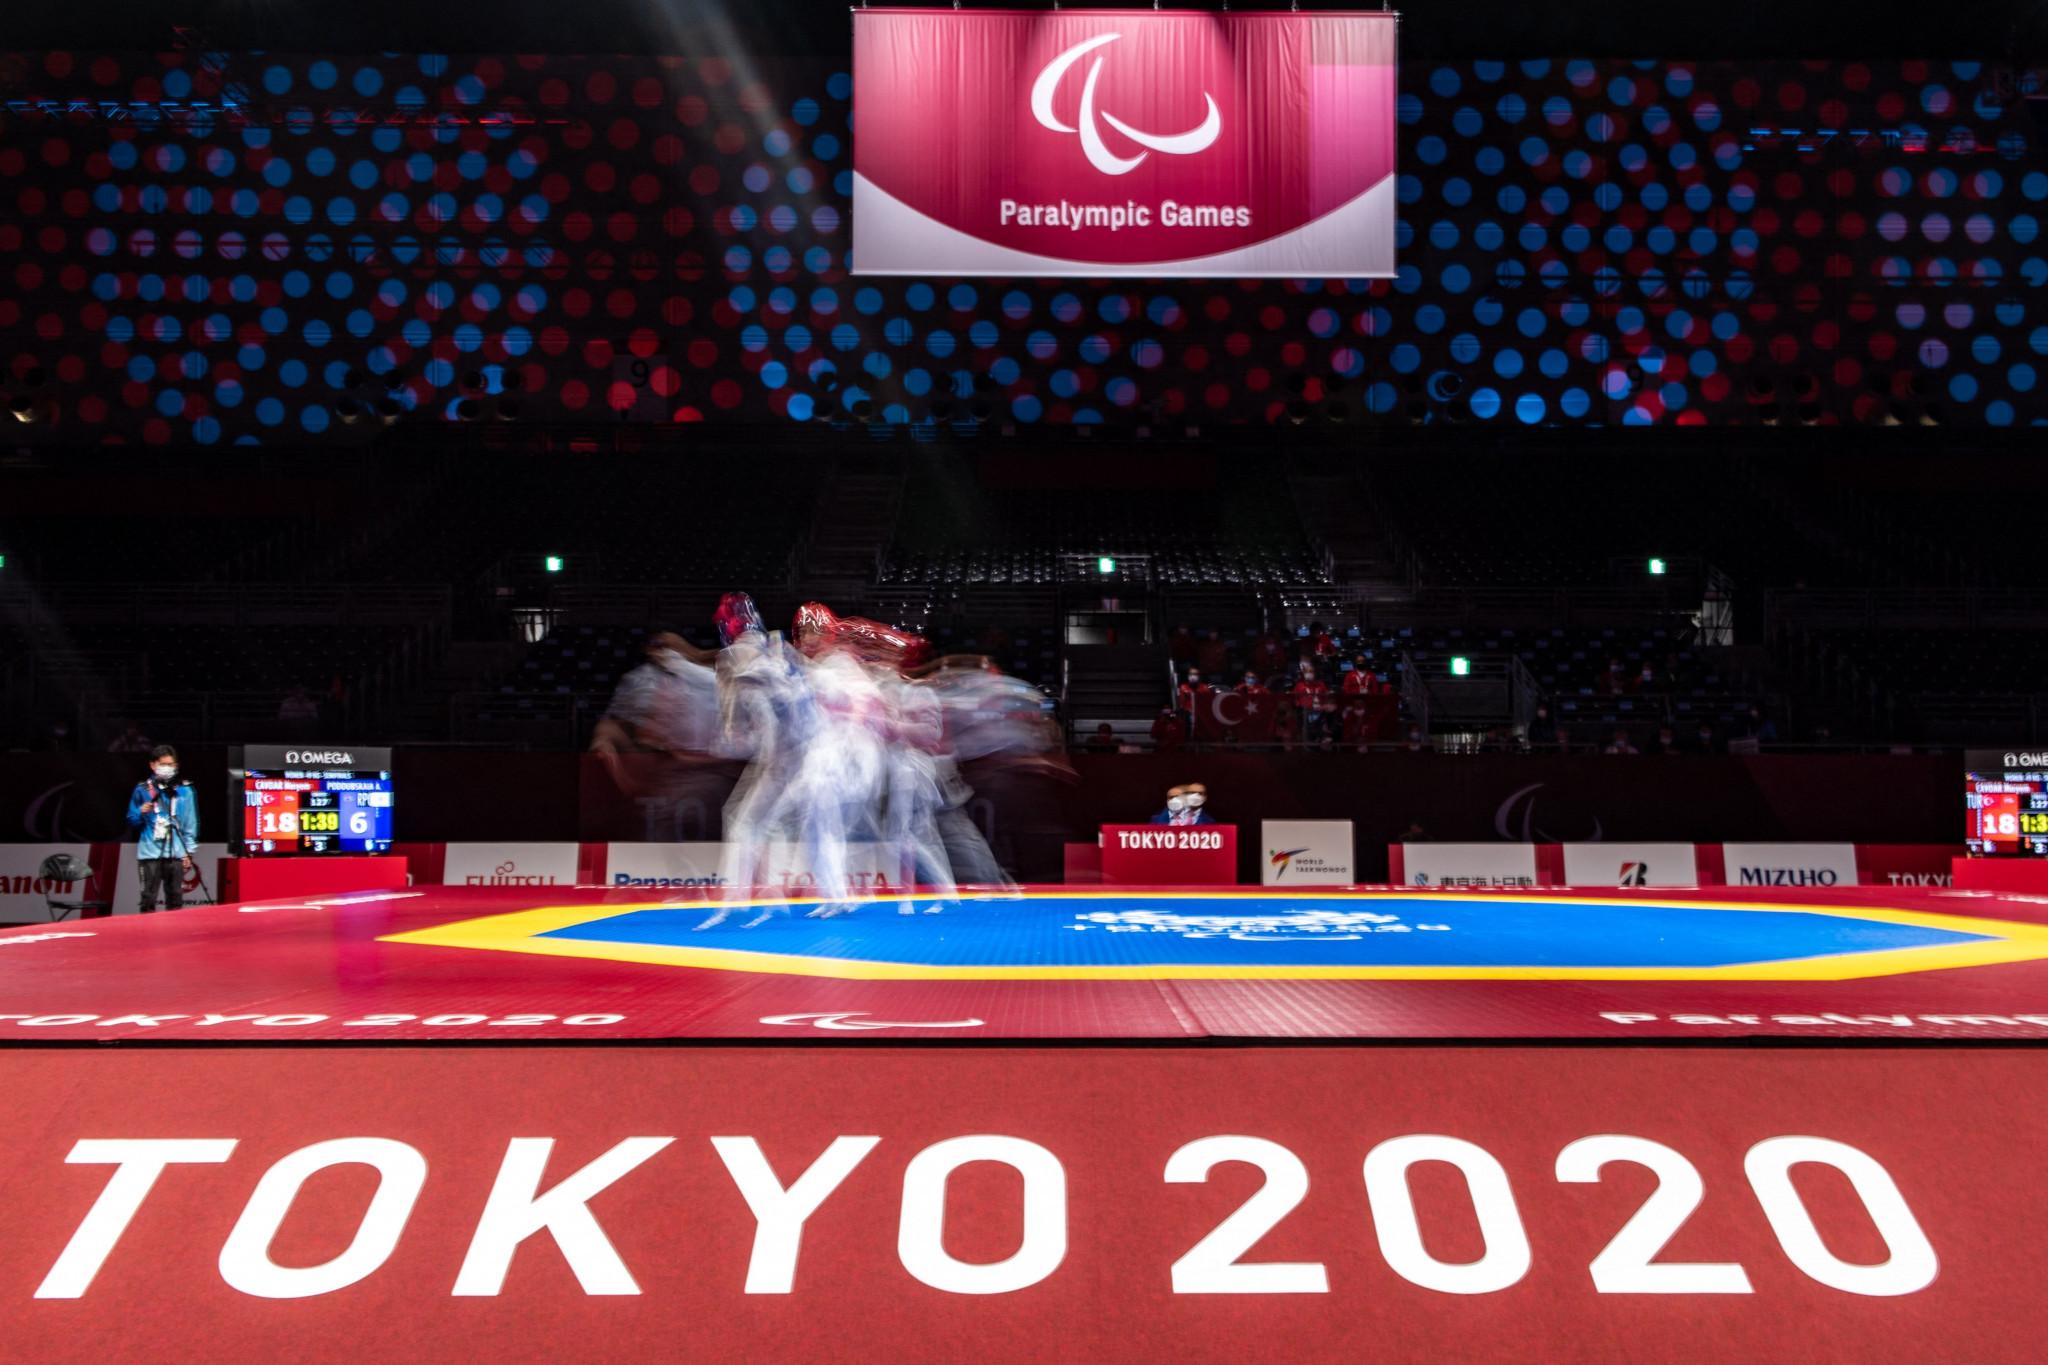 Gjessing wins long-awaited Paralympic taekwondo gold